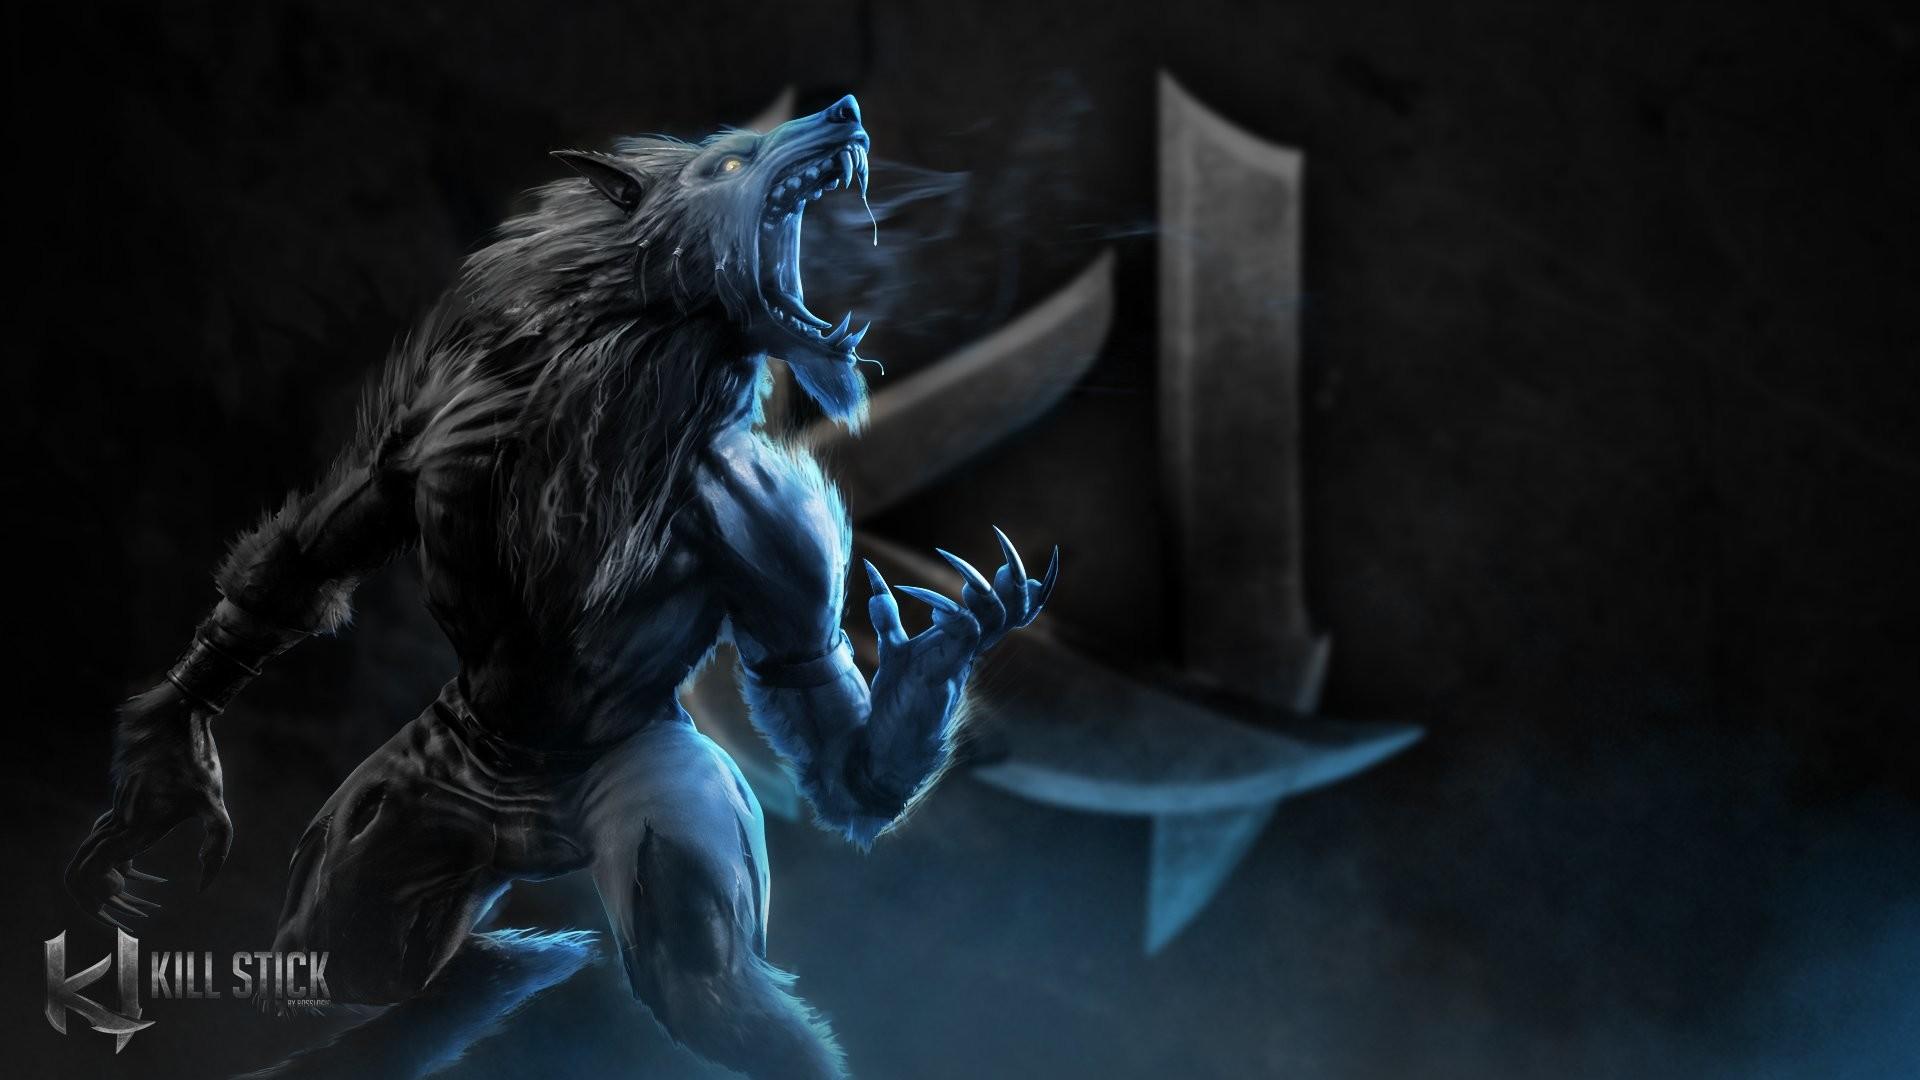 KILLER INSTINCT fighting fantasy game game (71) wallpaper | |  341898 | WallpaperUP